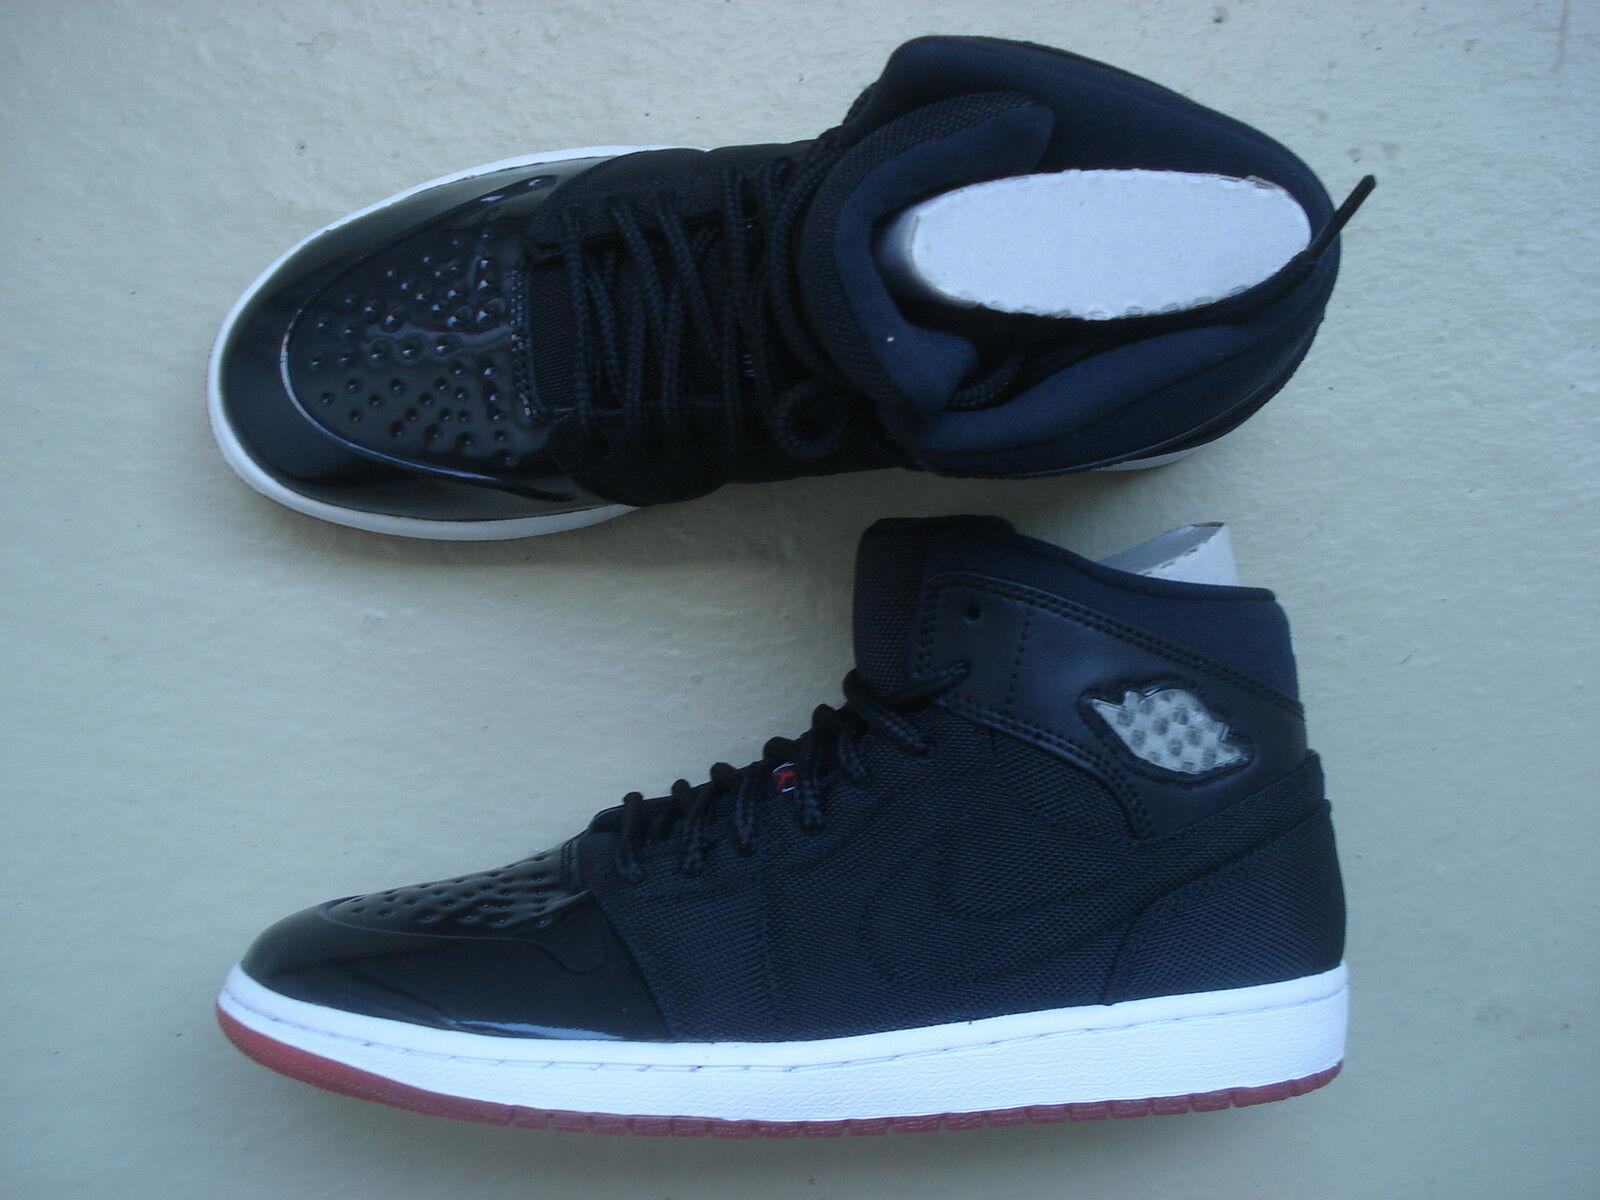 Nike Air 44.5 Jordan 1/i retro'95 TXT 44.5 Air bred Negro/True redBlanco 47d5a1